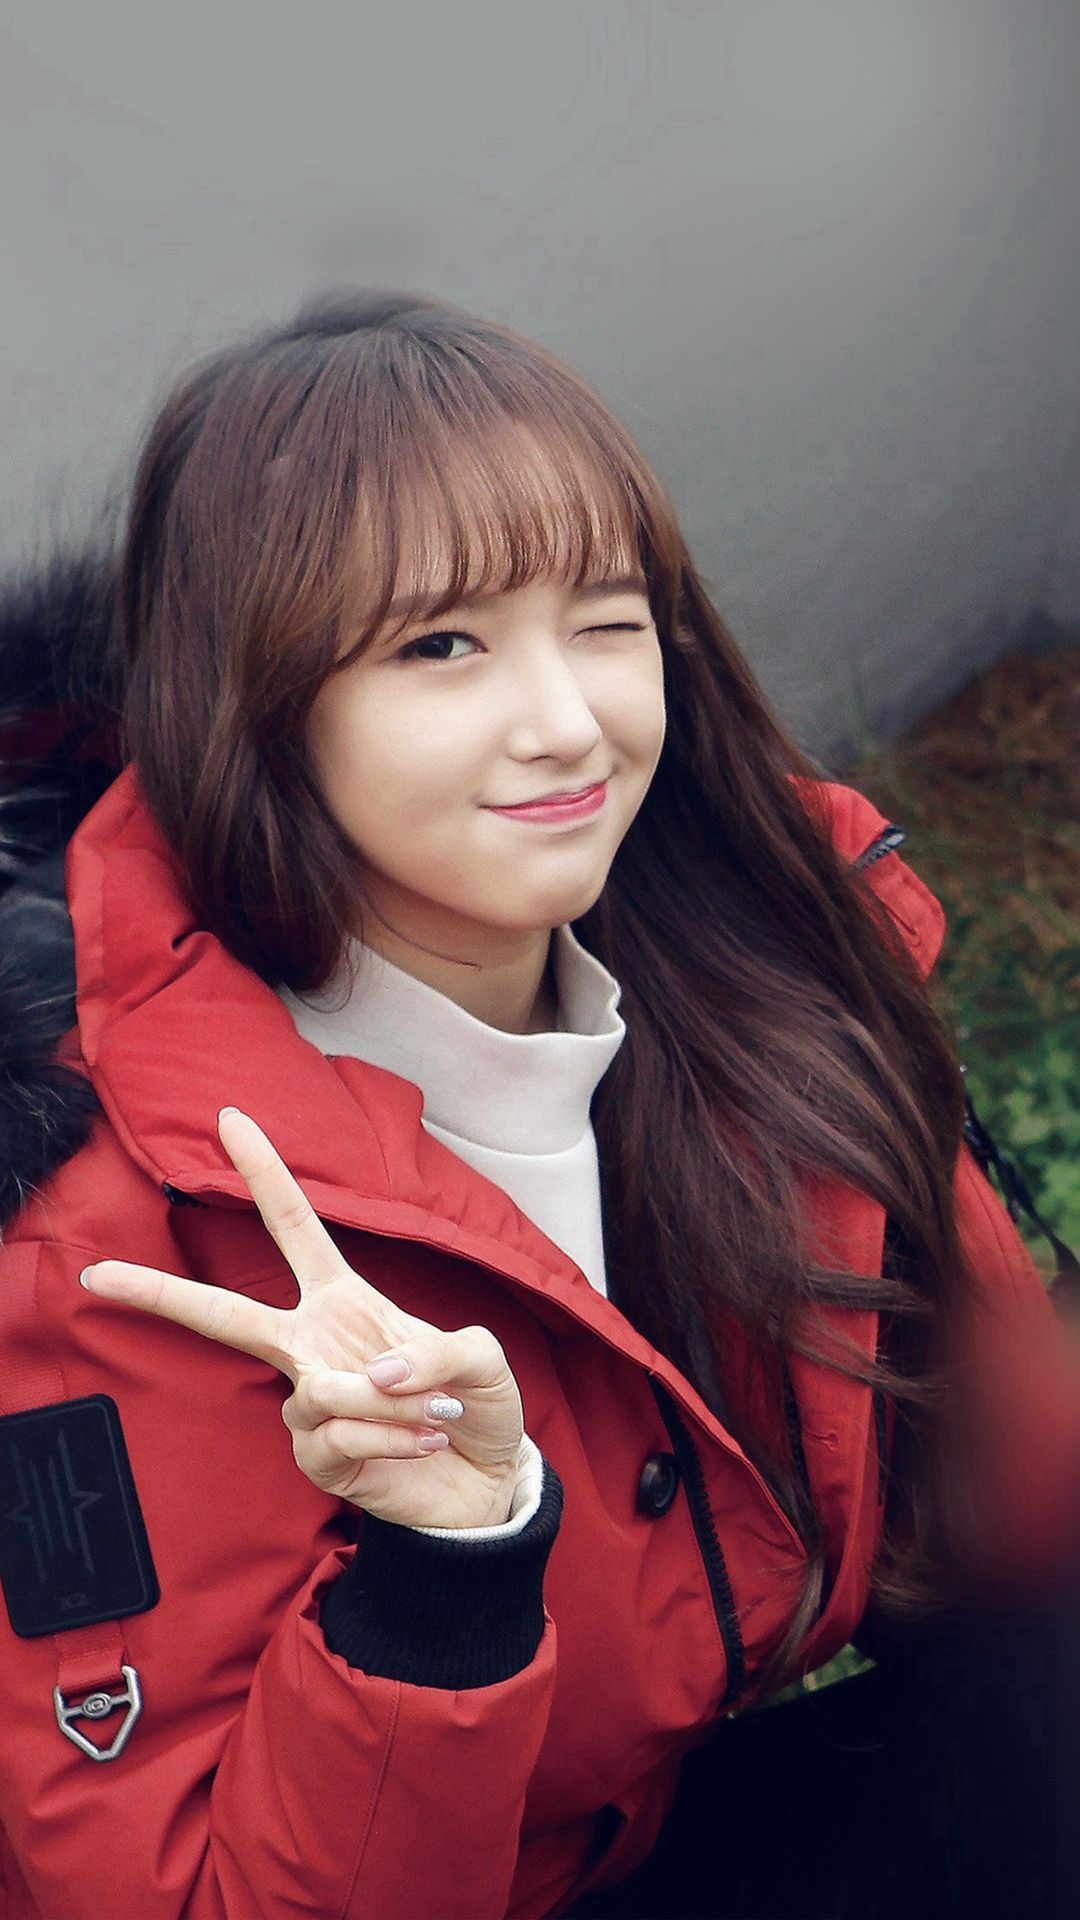 Sungso Kpop Girl Spacegirl iPhone 7 wallpaper Iphone